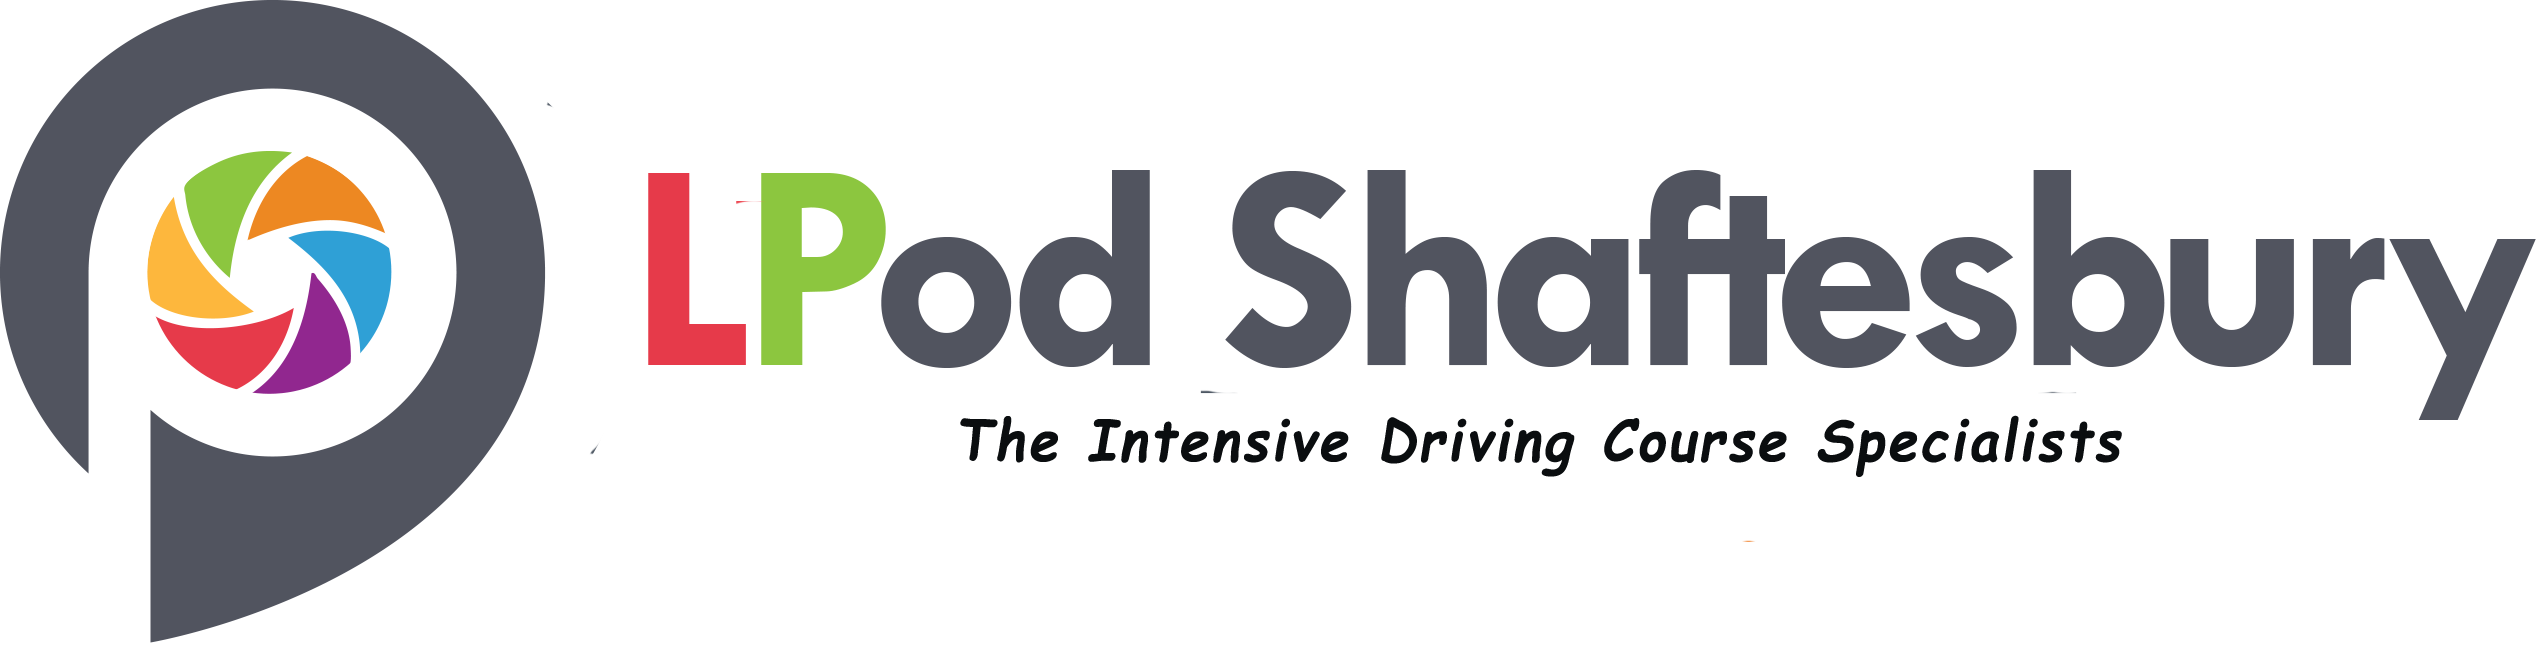 intensive driving courses shaftesbury, one week driving courses Shaftesbury, fast pass driving courses Shaftesbury